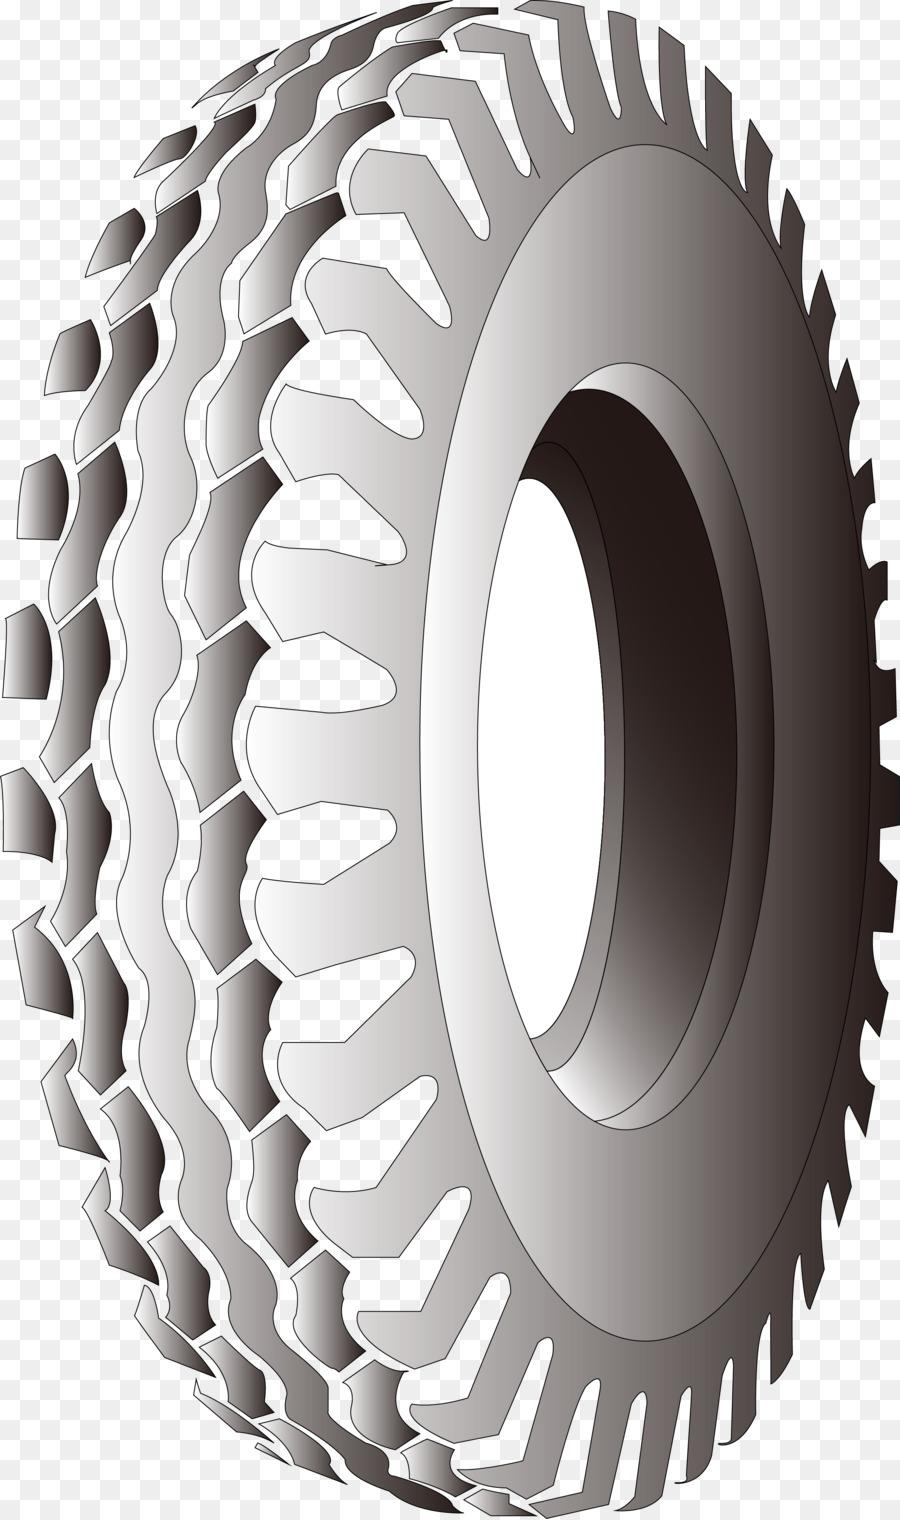 900x1520 Download Tire Car Skid Mark Vector Tires